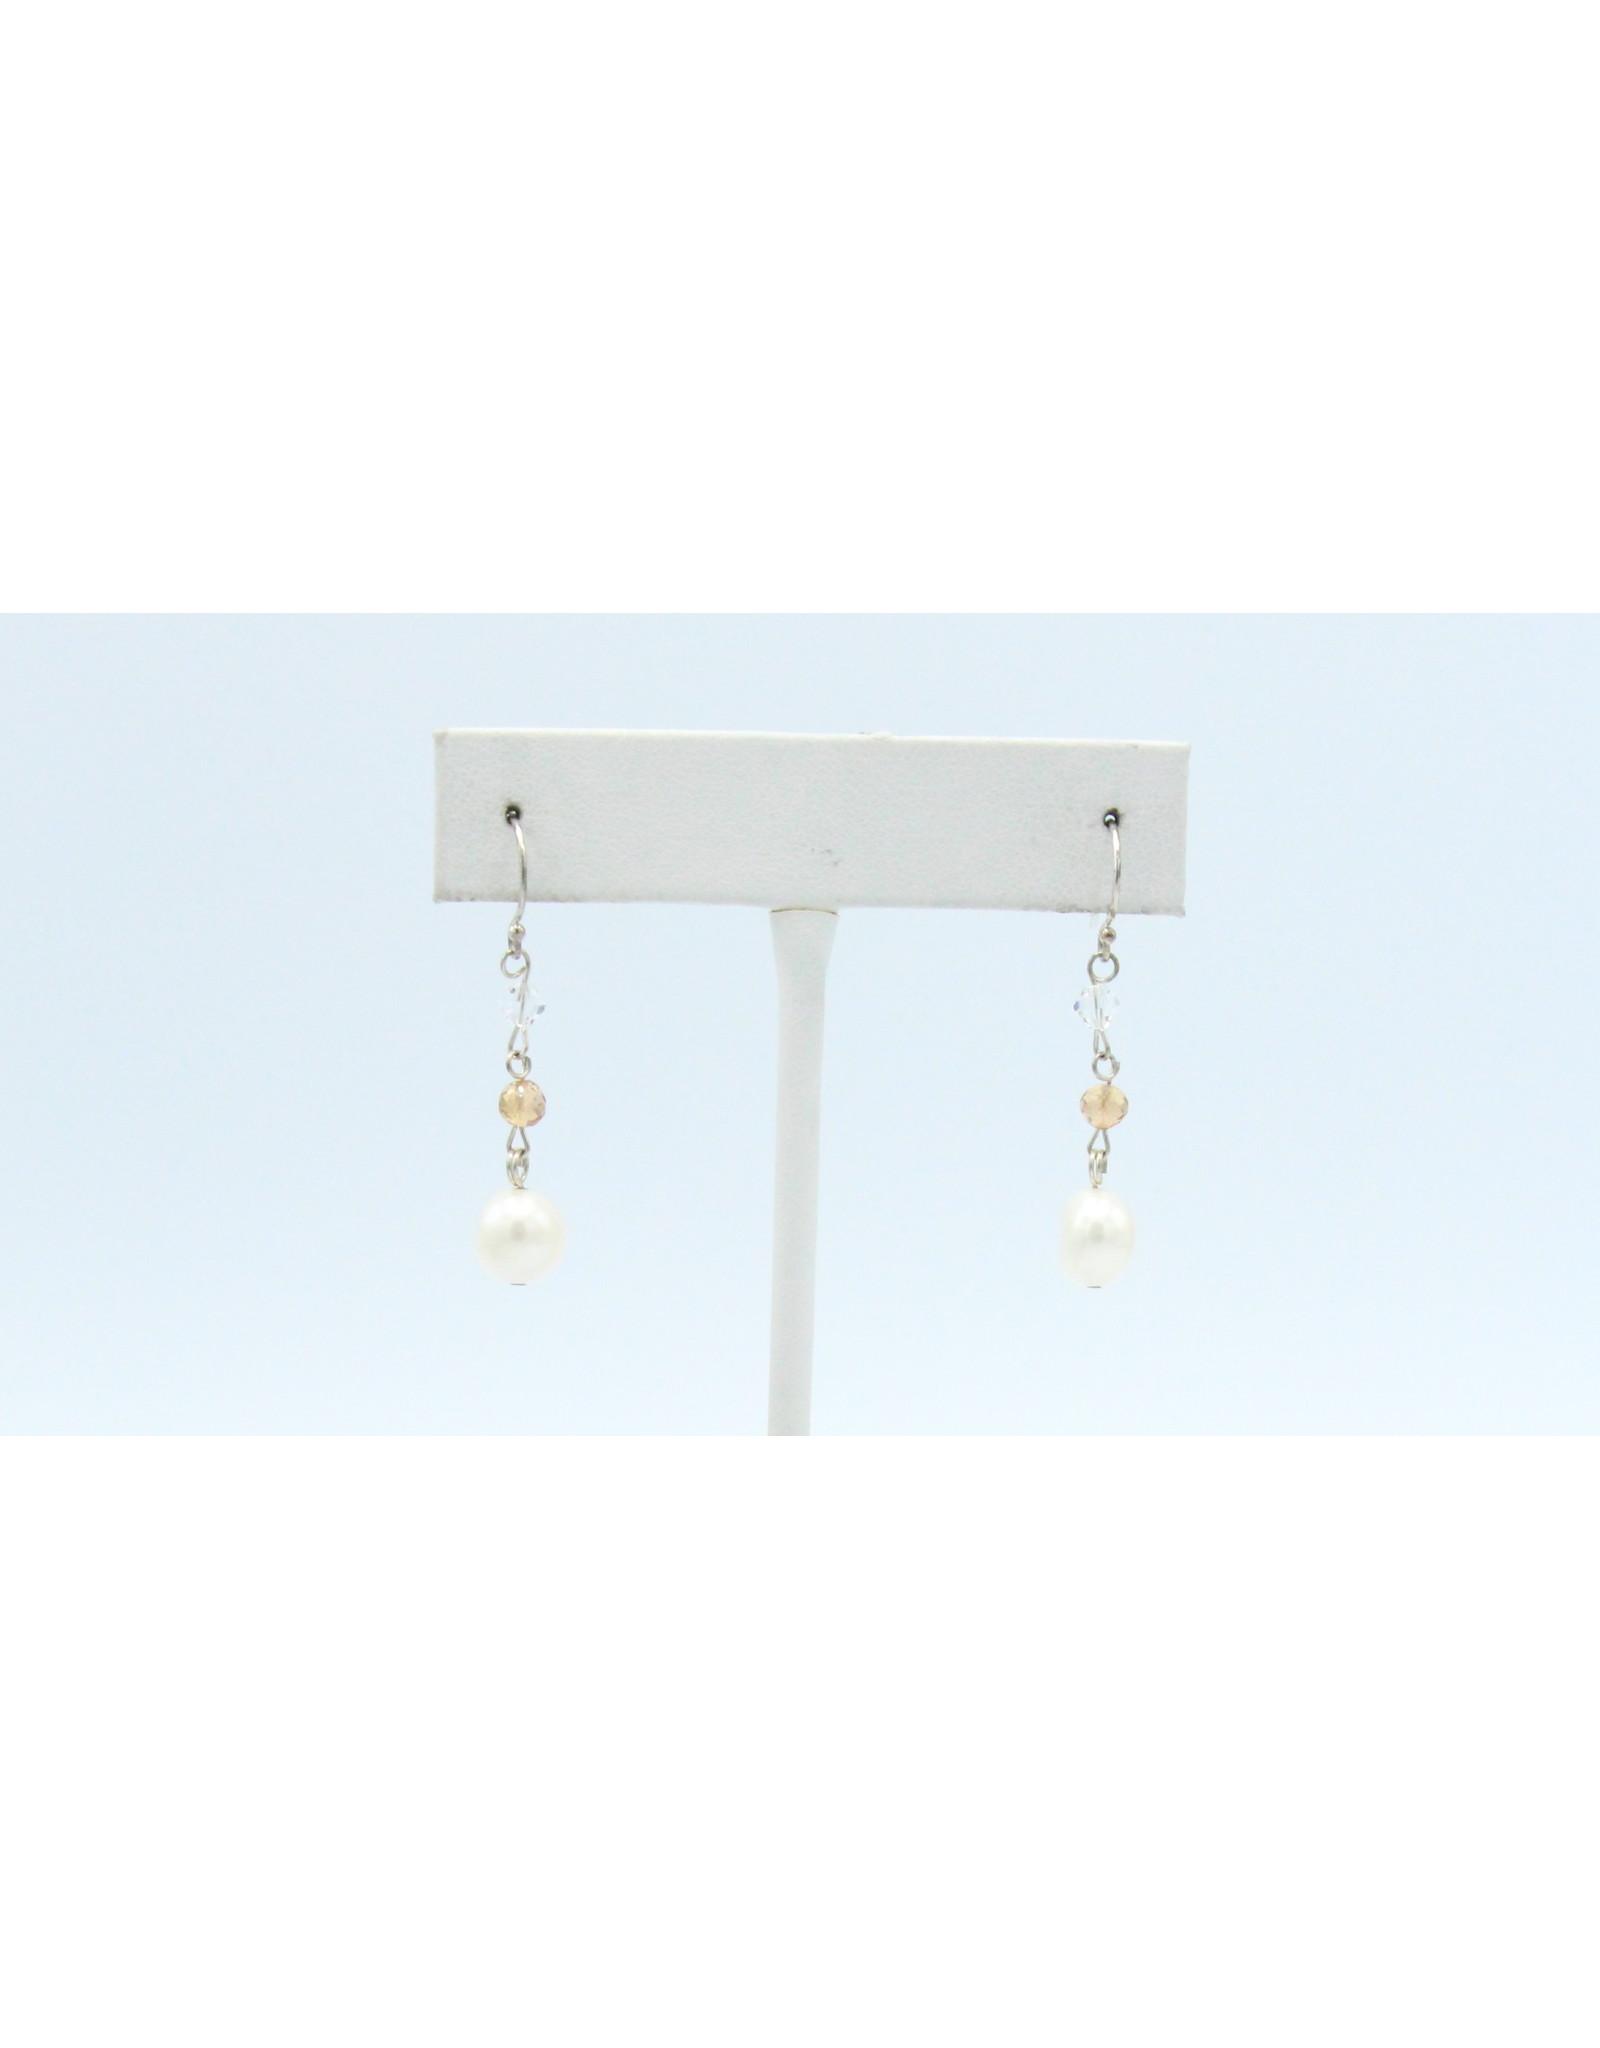 Grenat Hessonite Earrings with Pearl - ERGH04